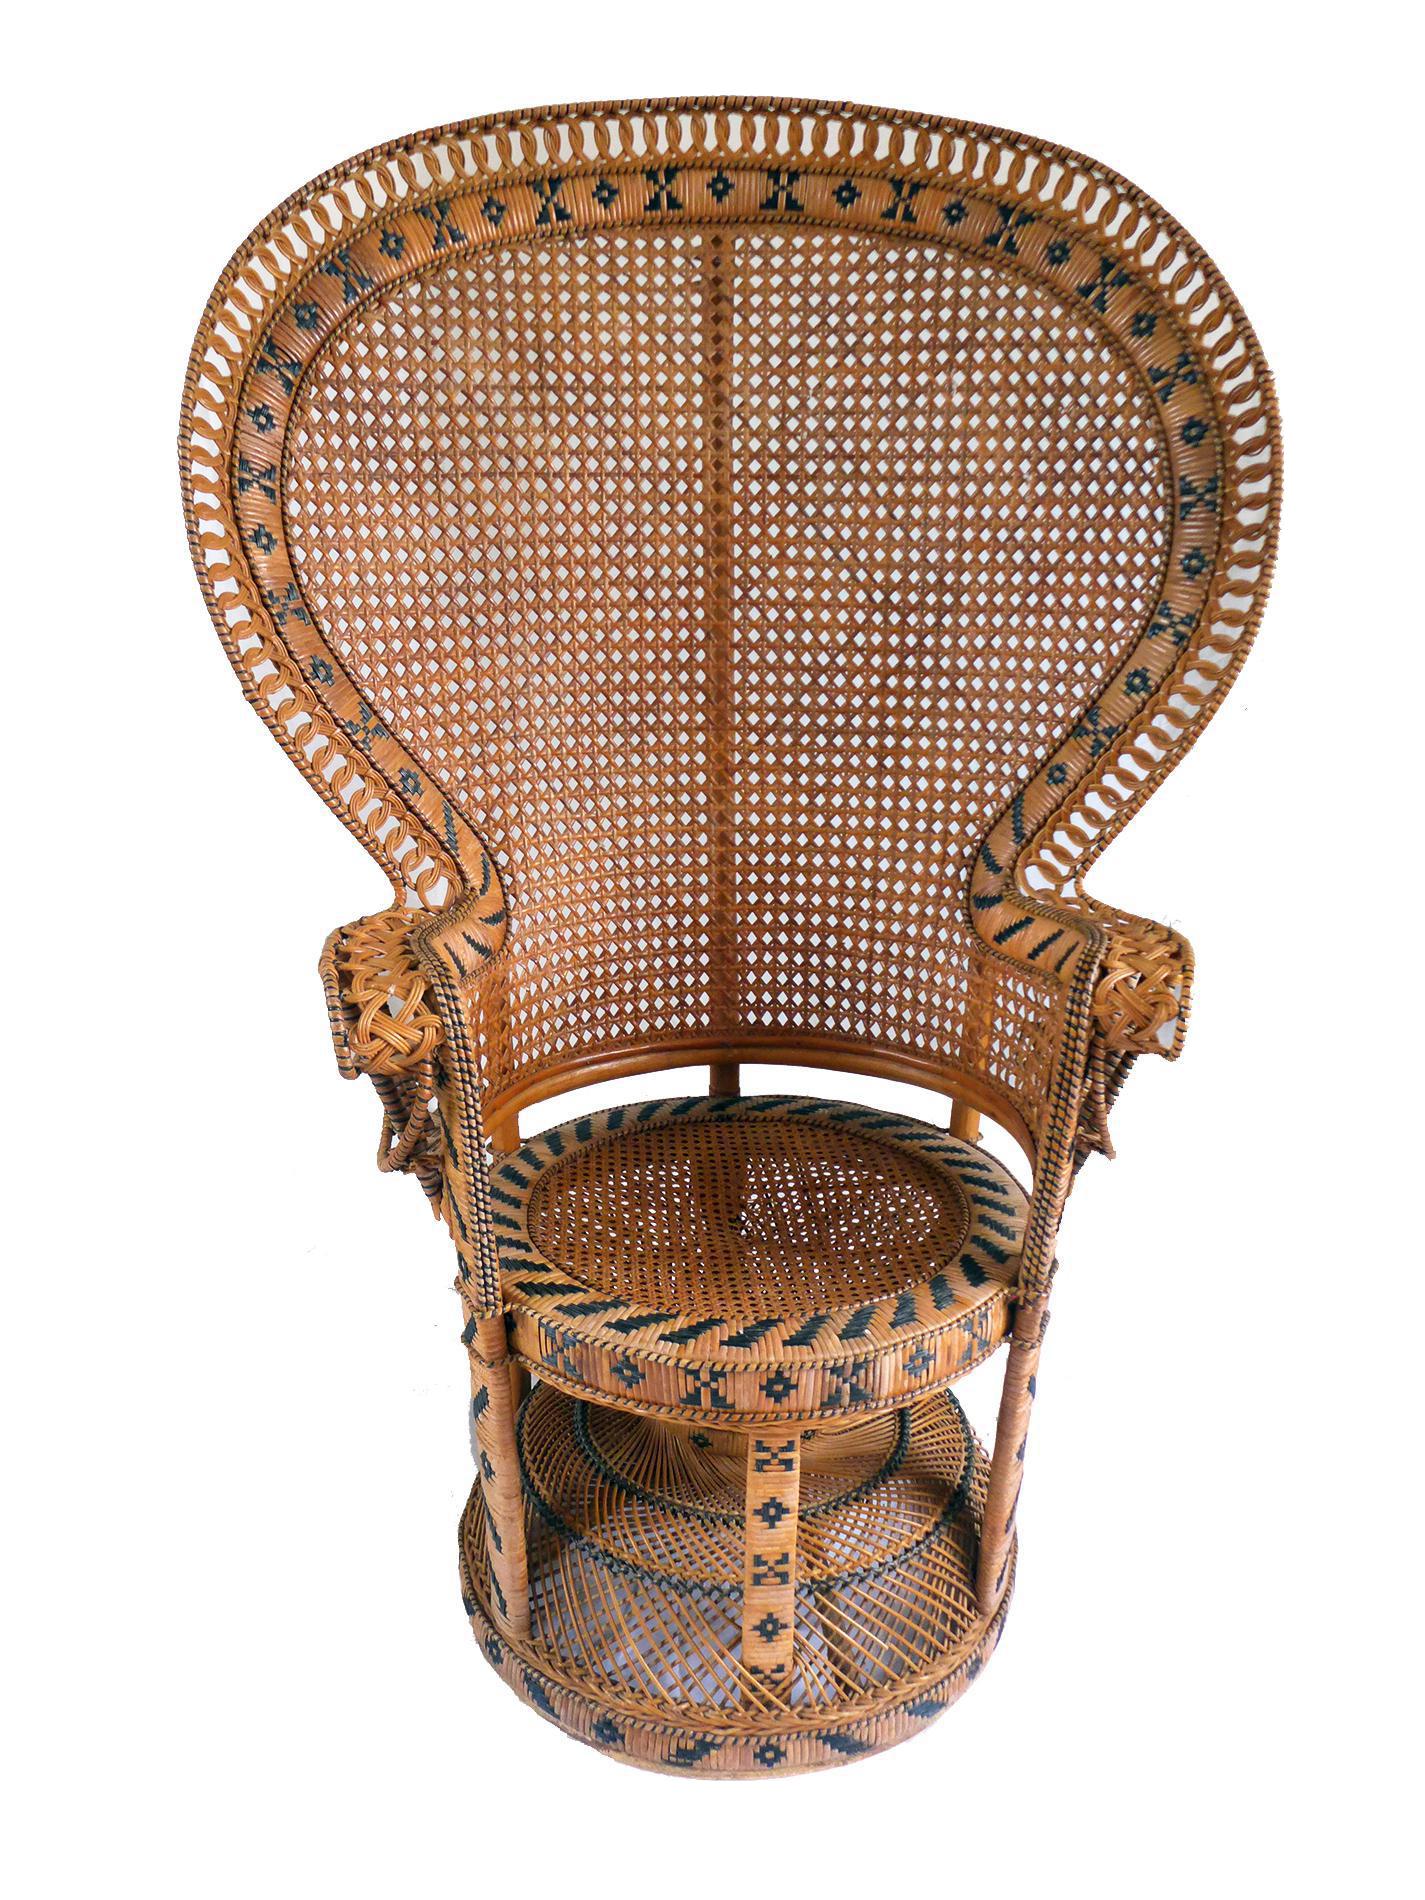 Vintage High Back Fan Peacock Rattan Chair